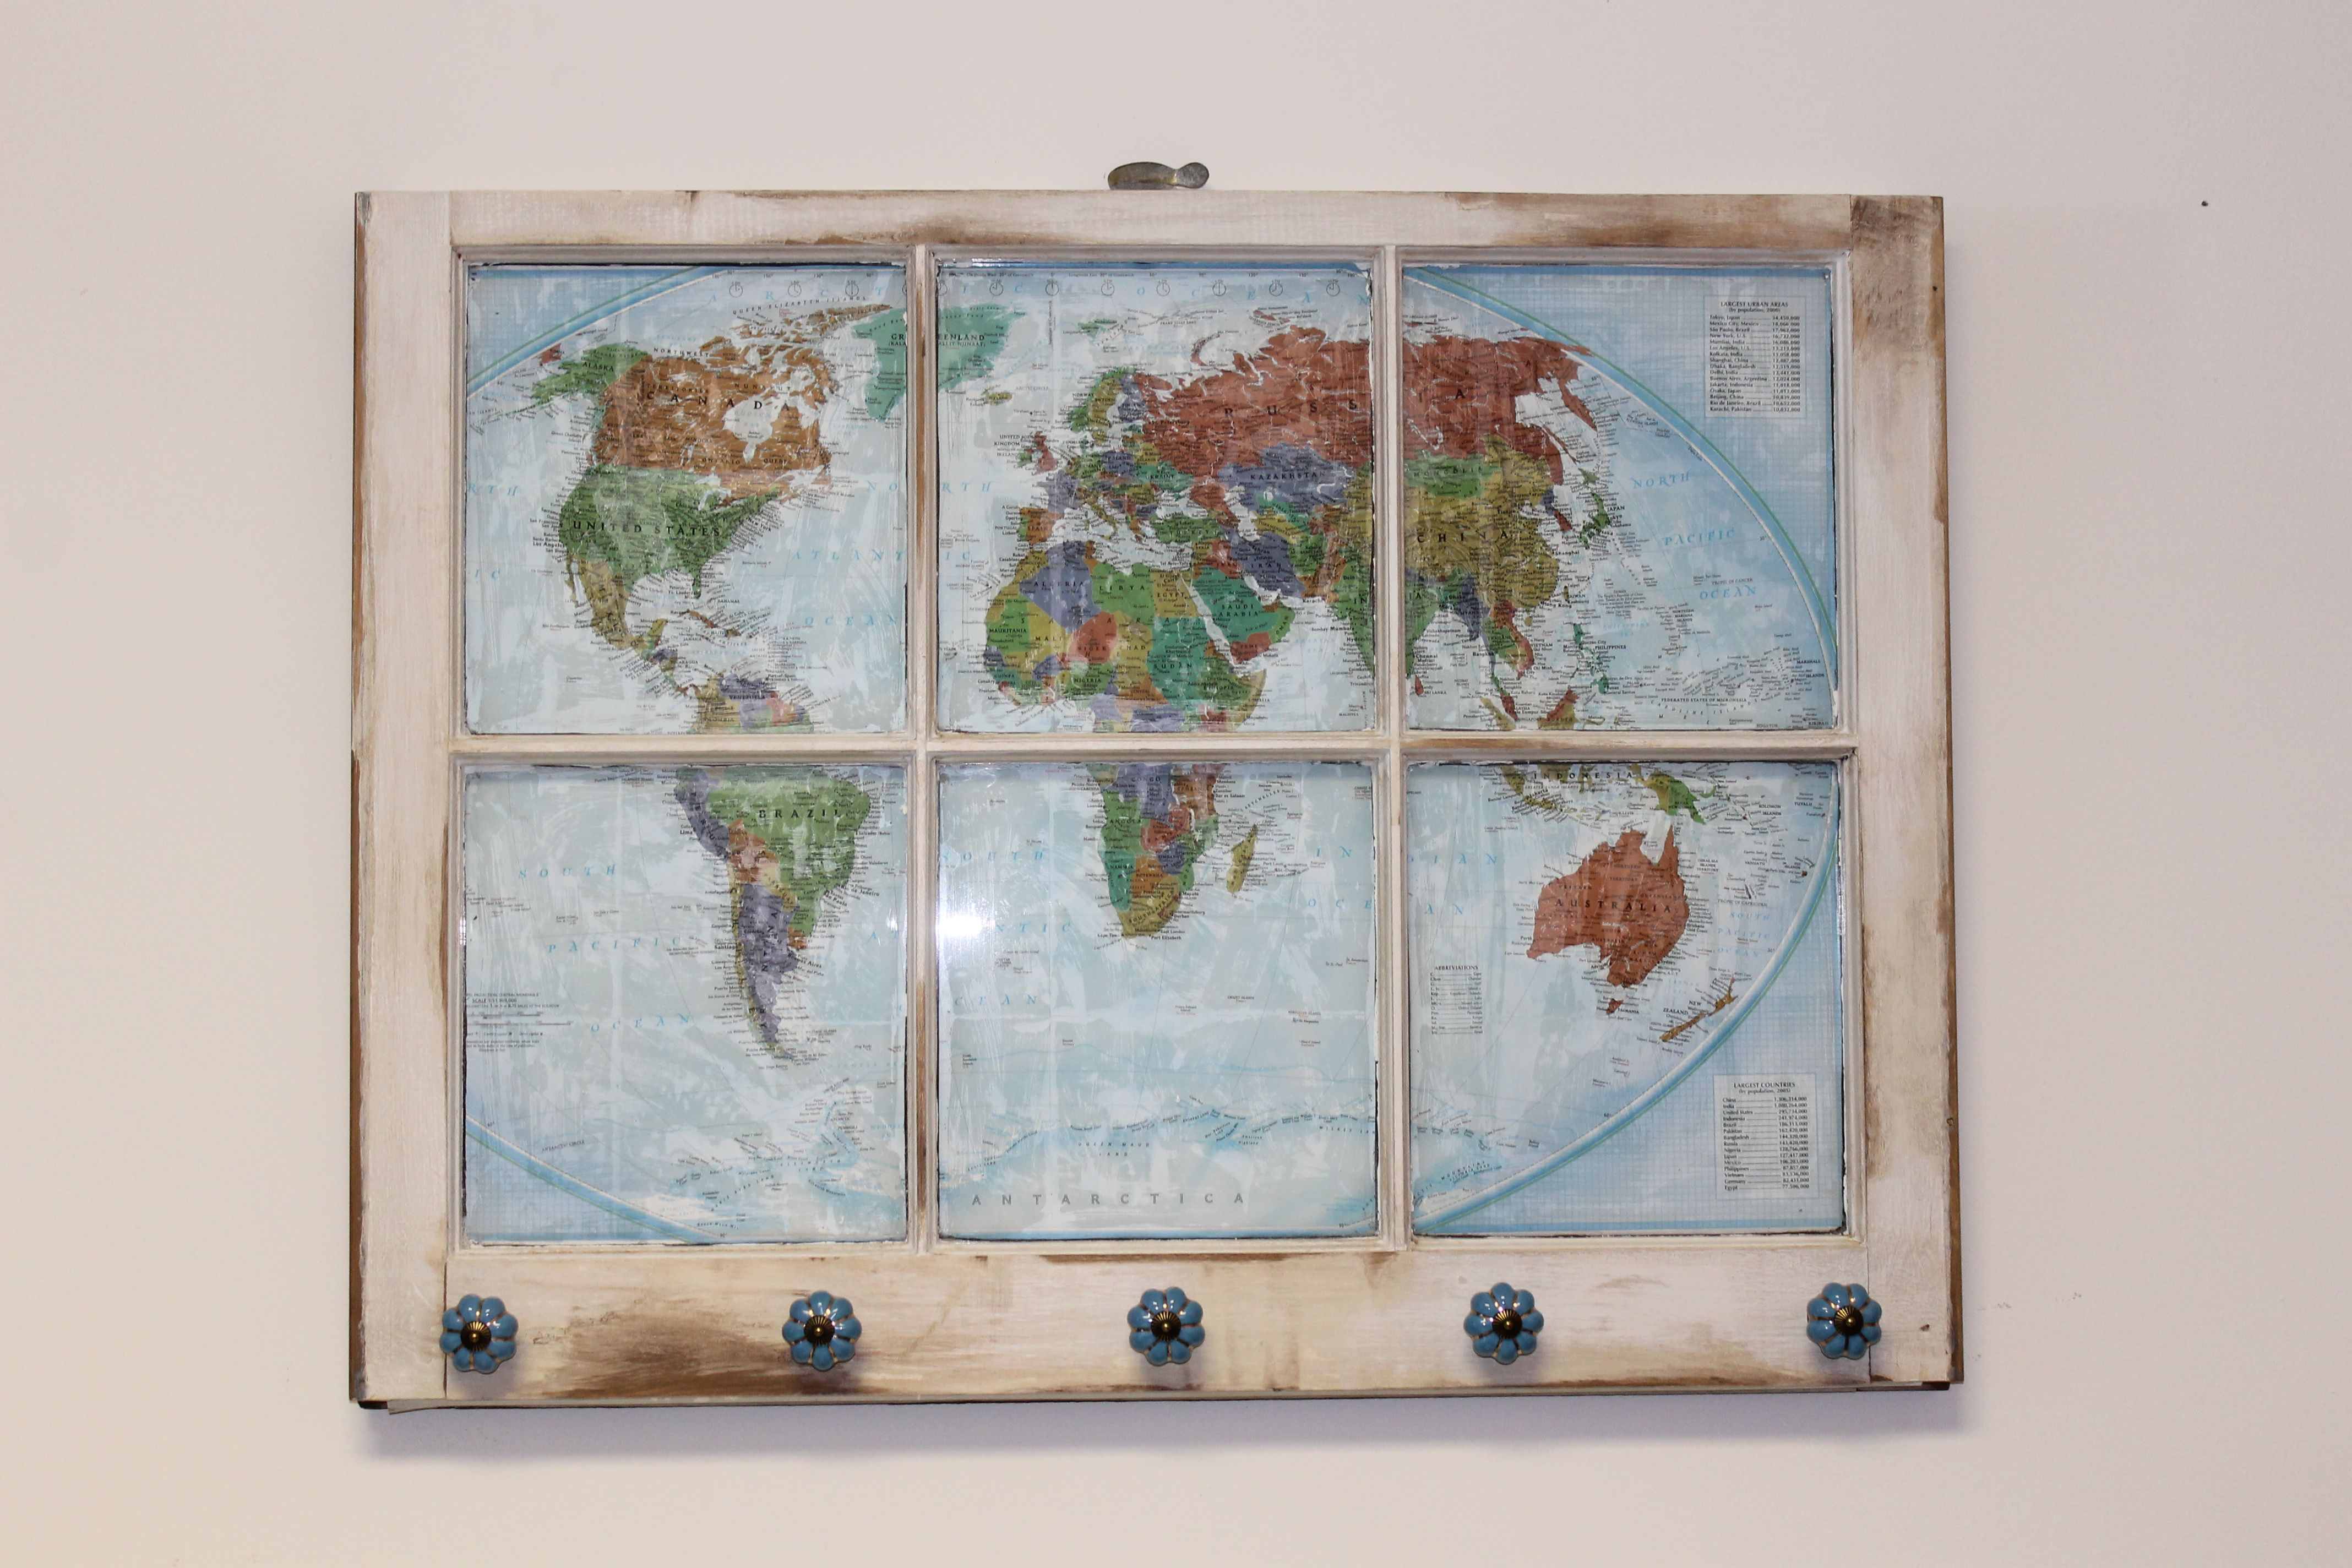 RESERVED Jewelry Organizer Necklace Rack Map Window